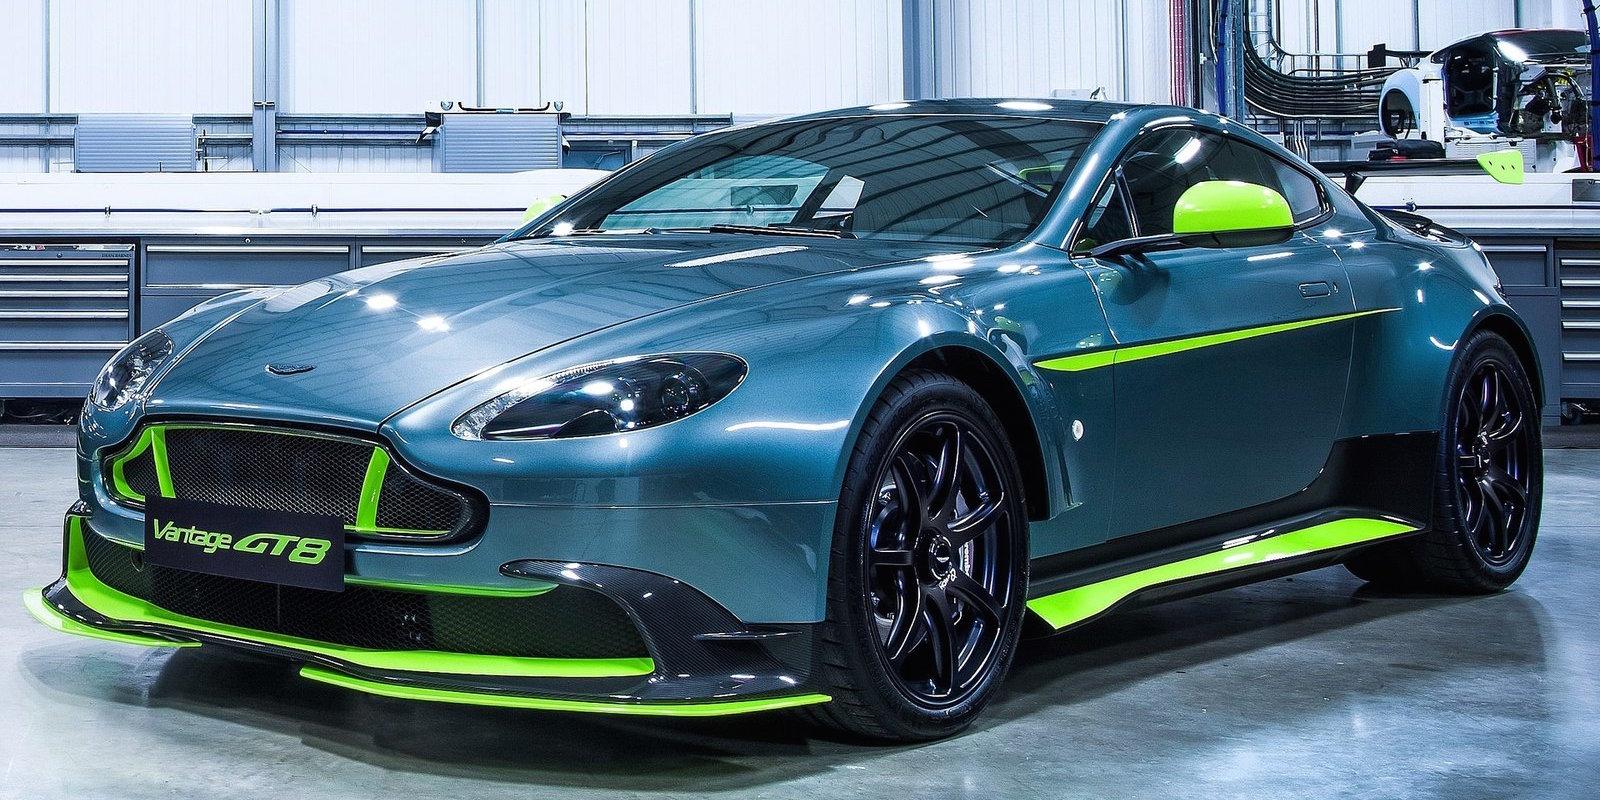 Aston Martin Vantage Cars For Sale